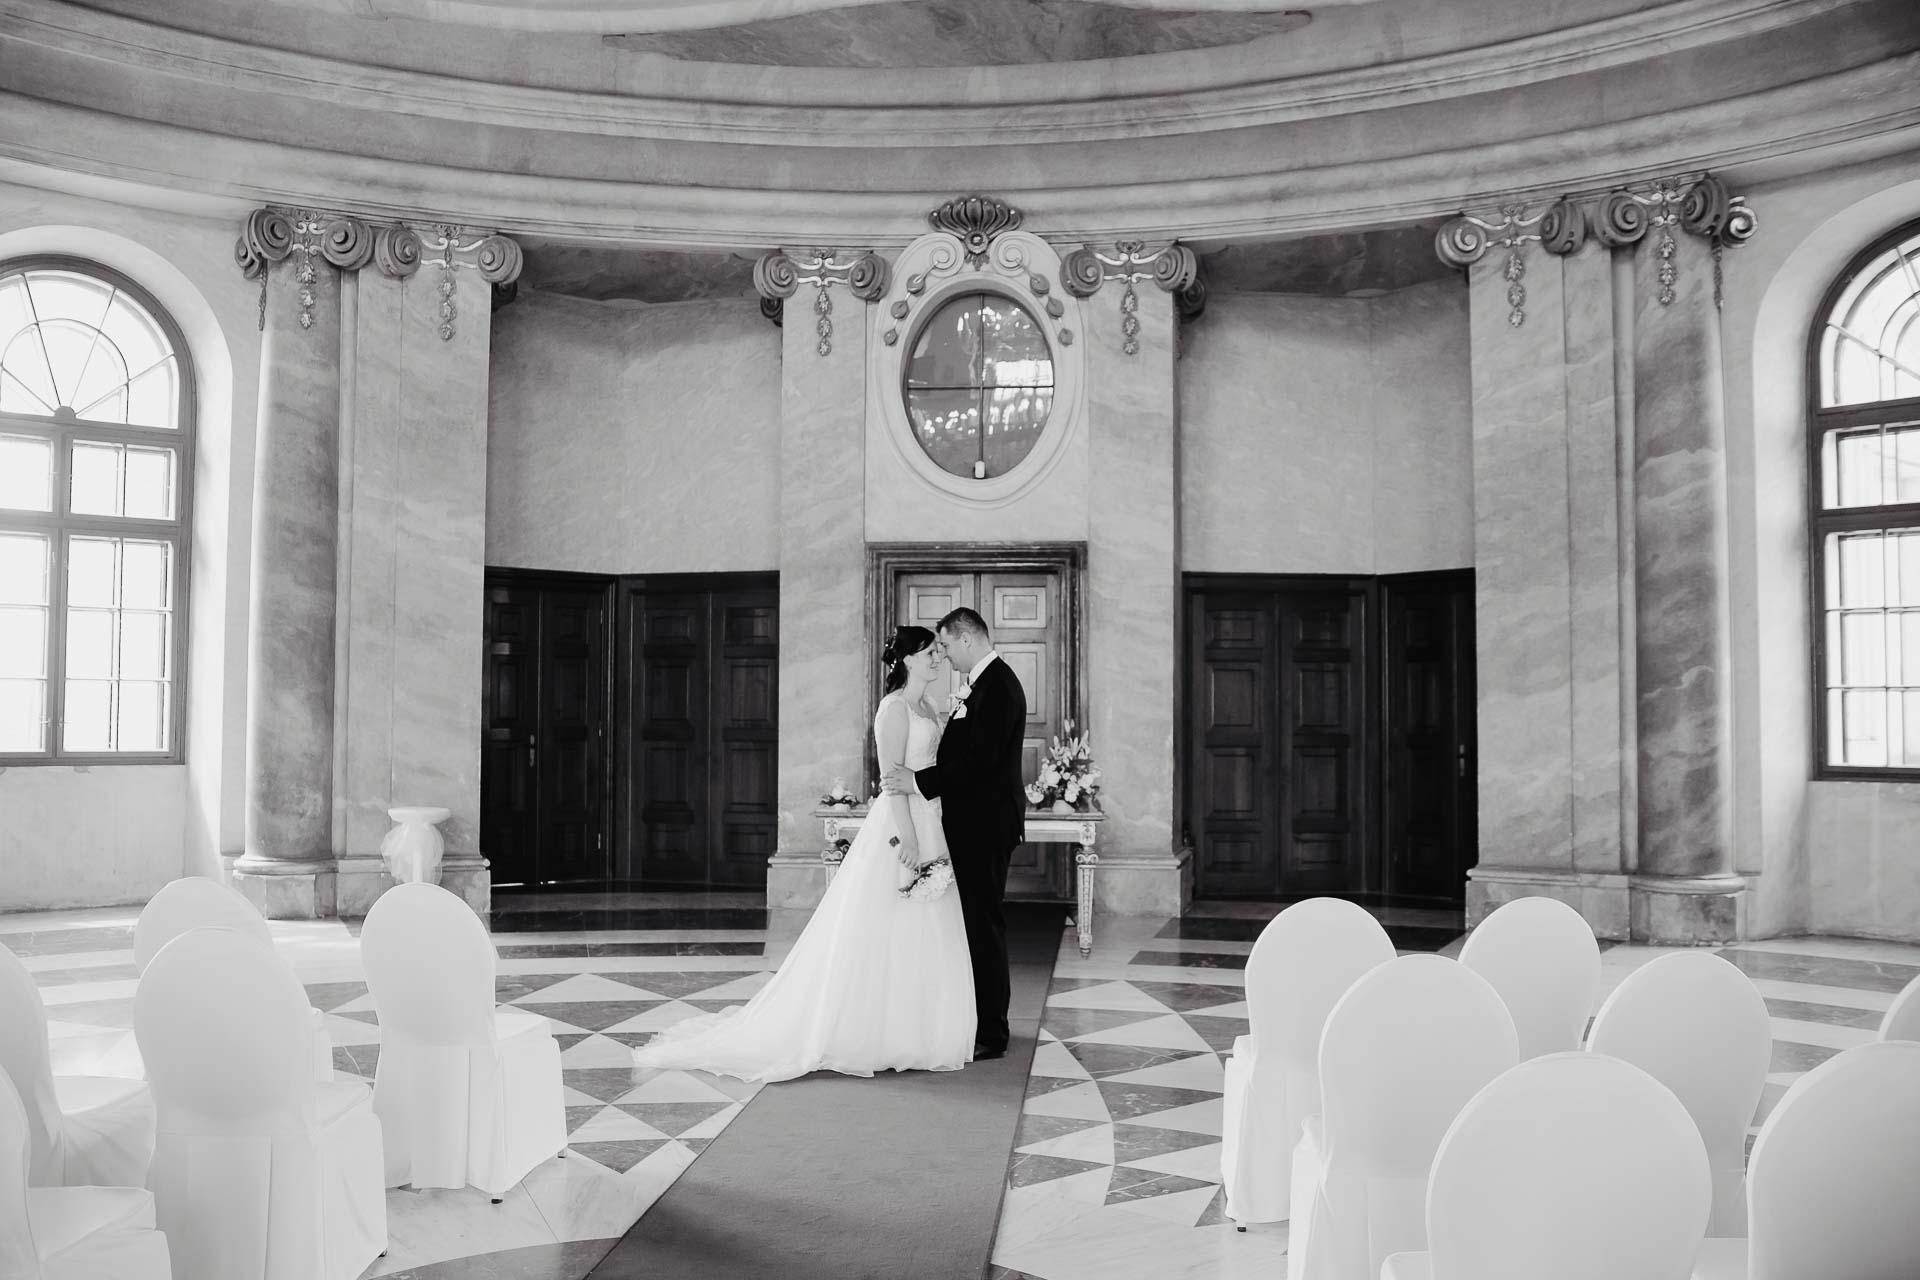 Svatební-fotograf-zámek-Karlova-Koruna-Chlumec-nad-Cidlinou-98